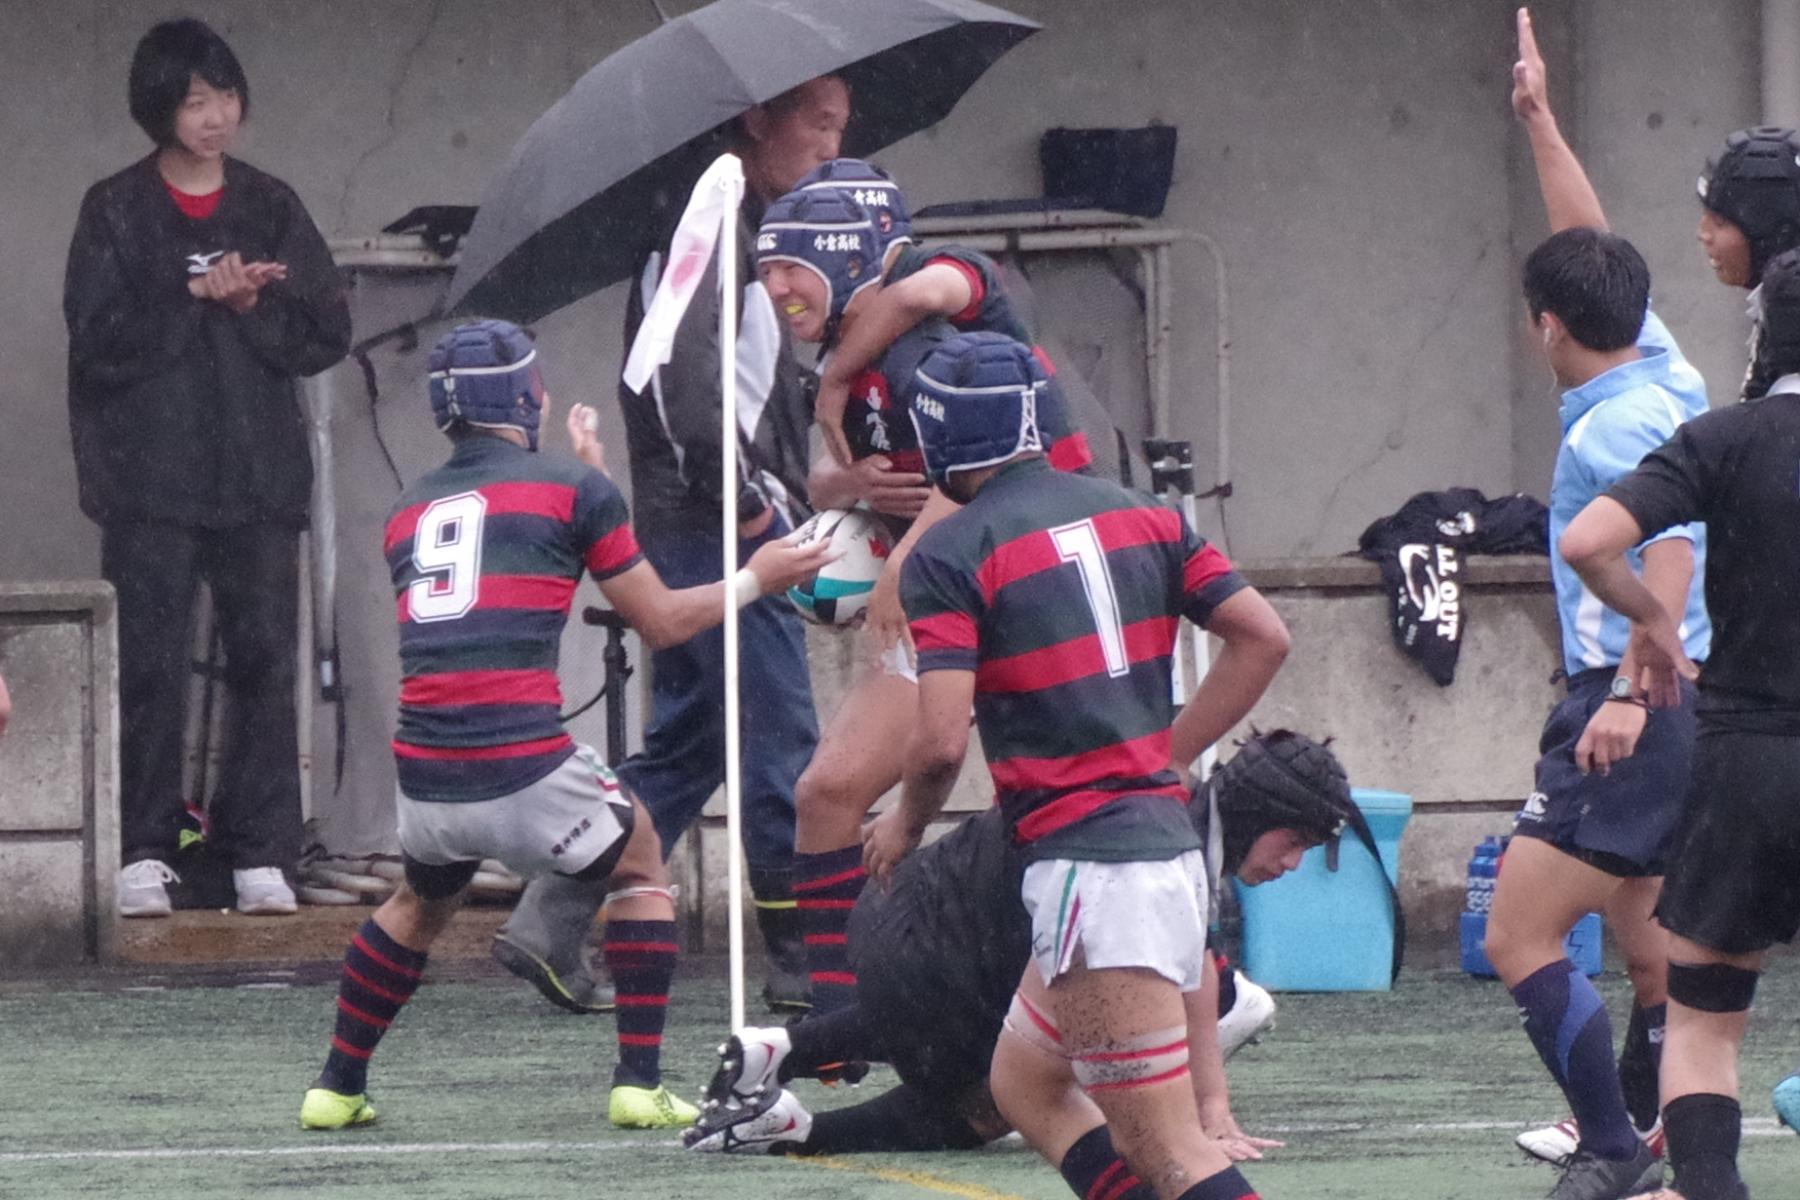 http://kokura-rugby.sakura.ne.jp/180513_143416_0747.jpg